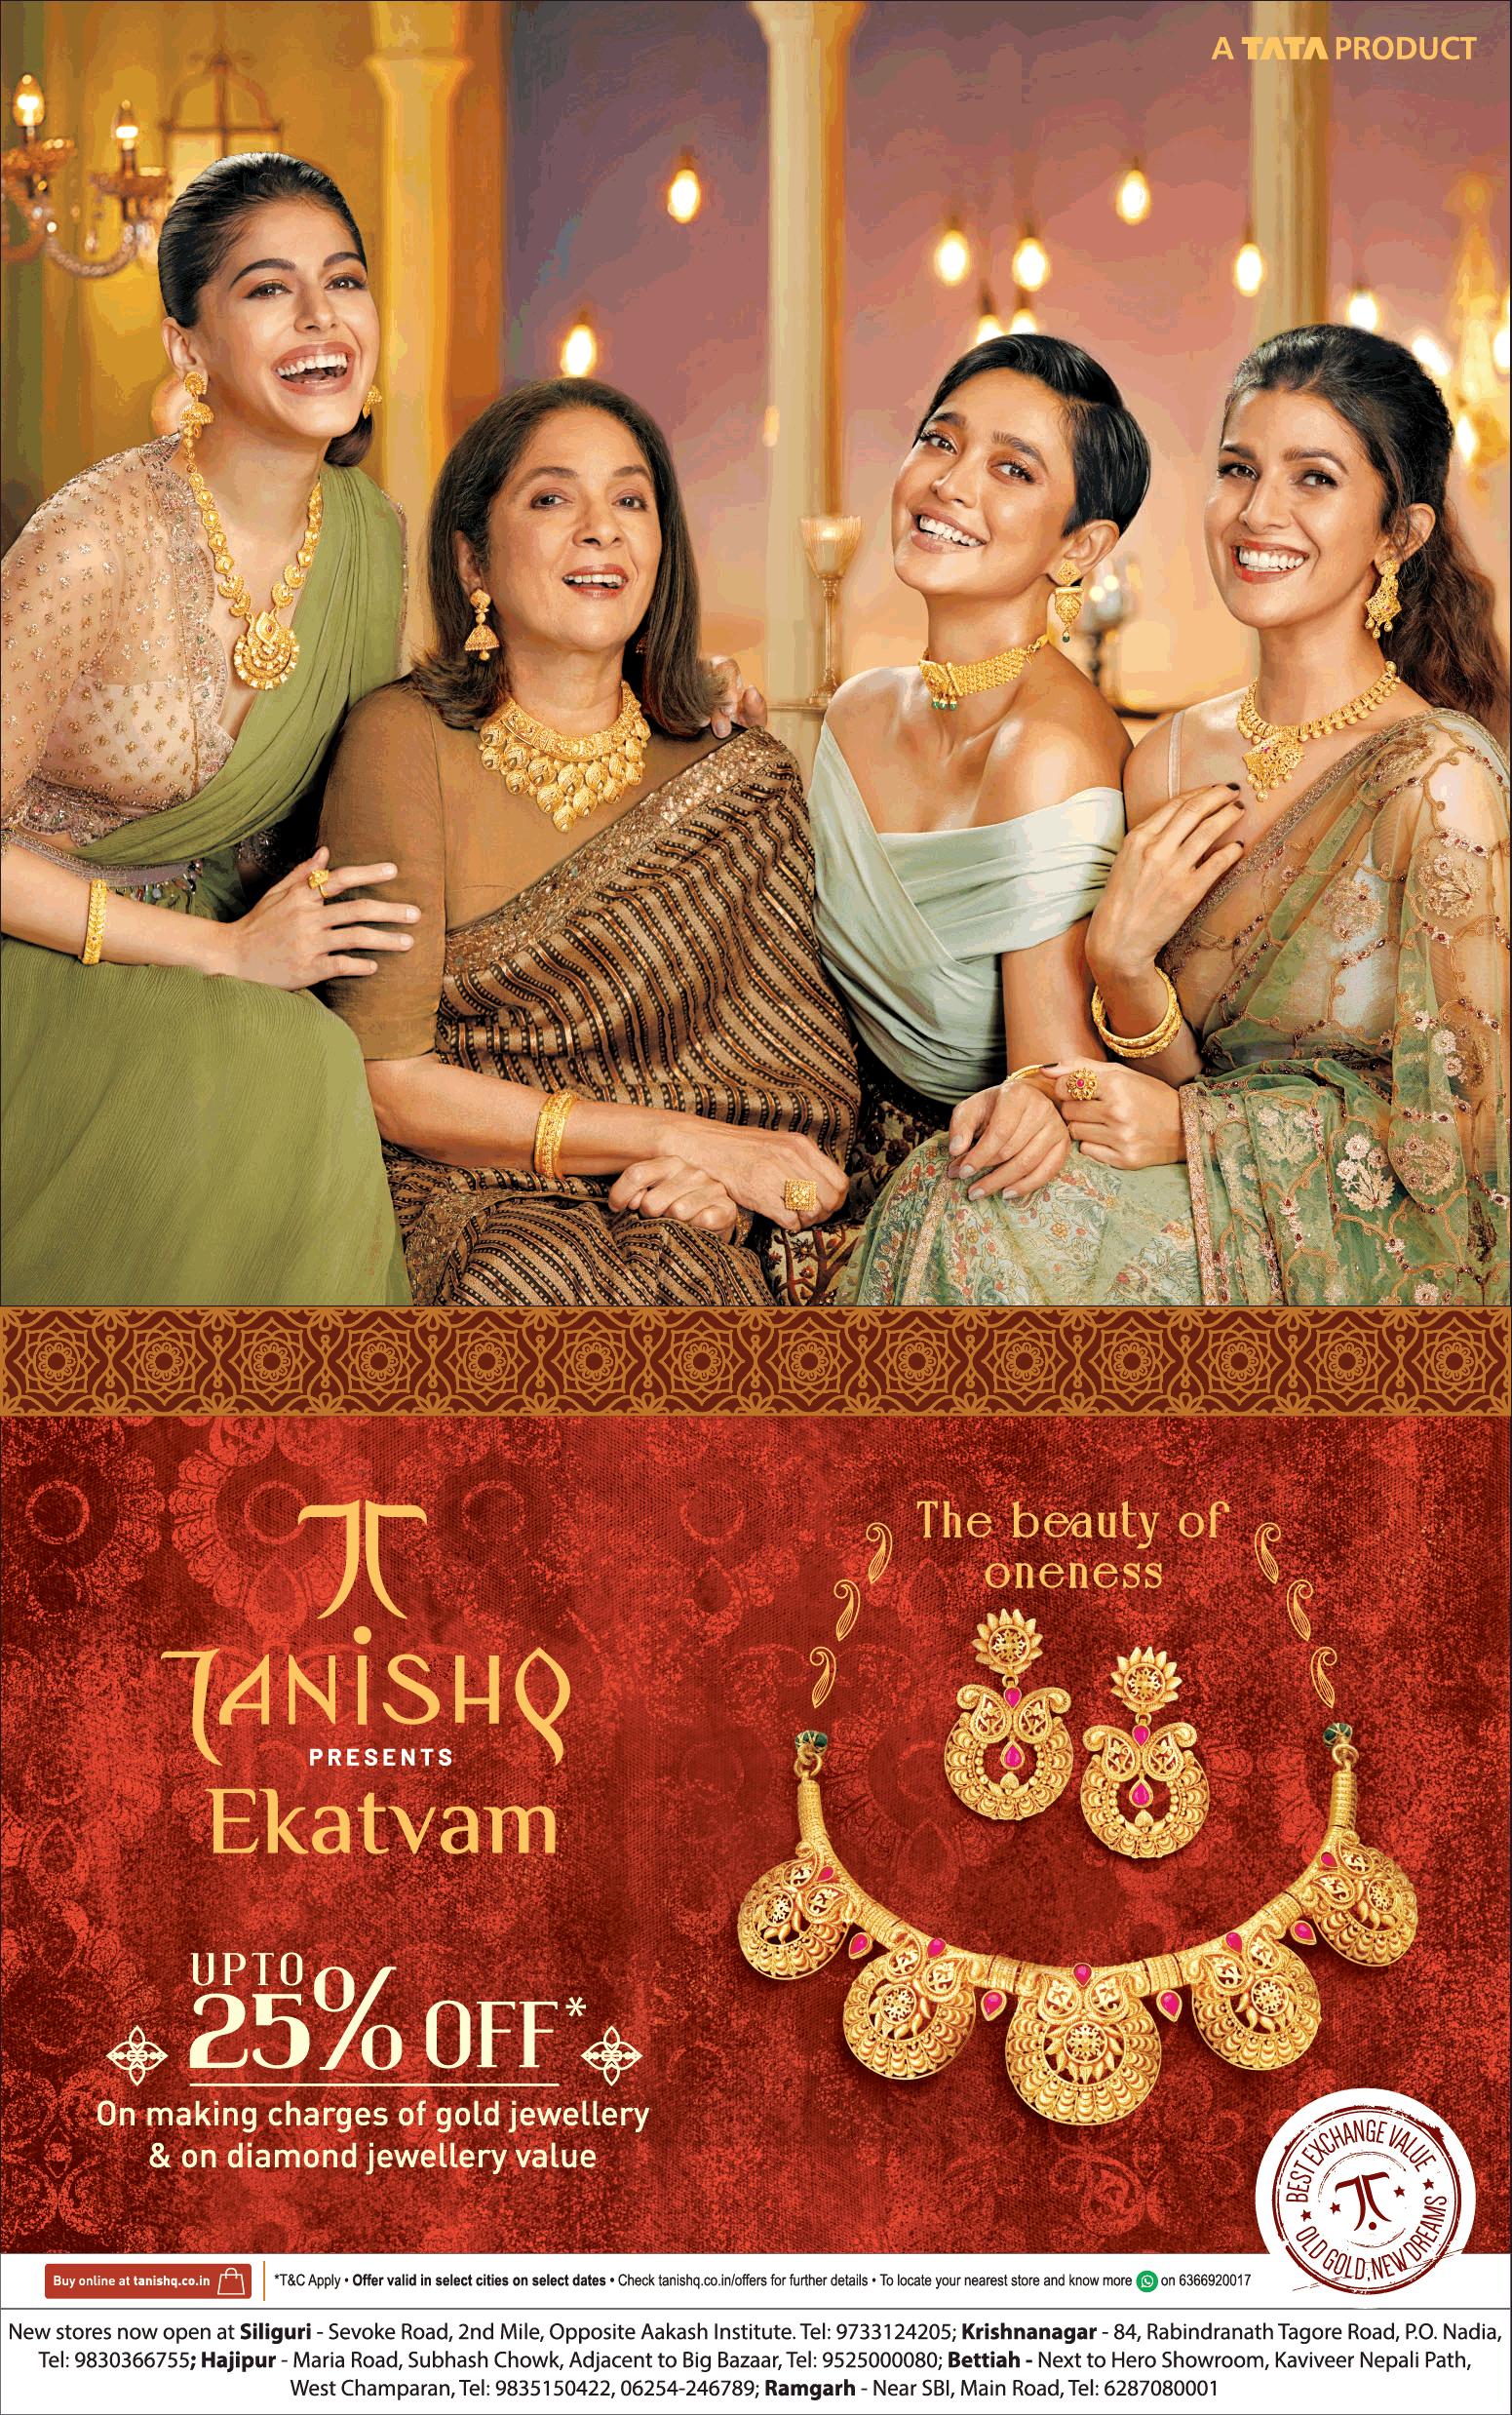 tanishq-ekatvam-casting-neena-gupta-nimrat-kaur-ad-toi-kolkata-31-10-2020